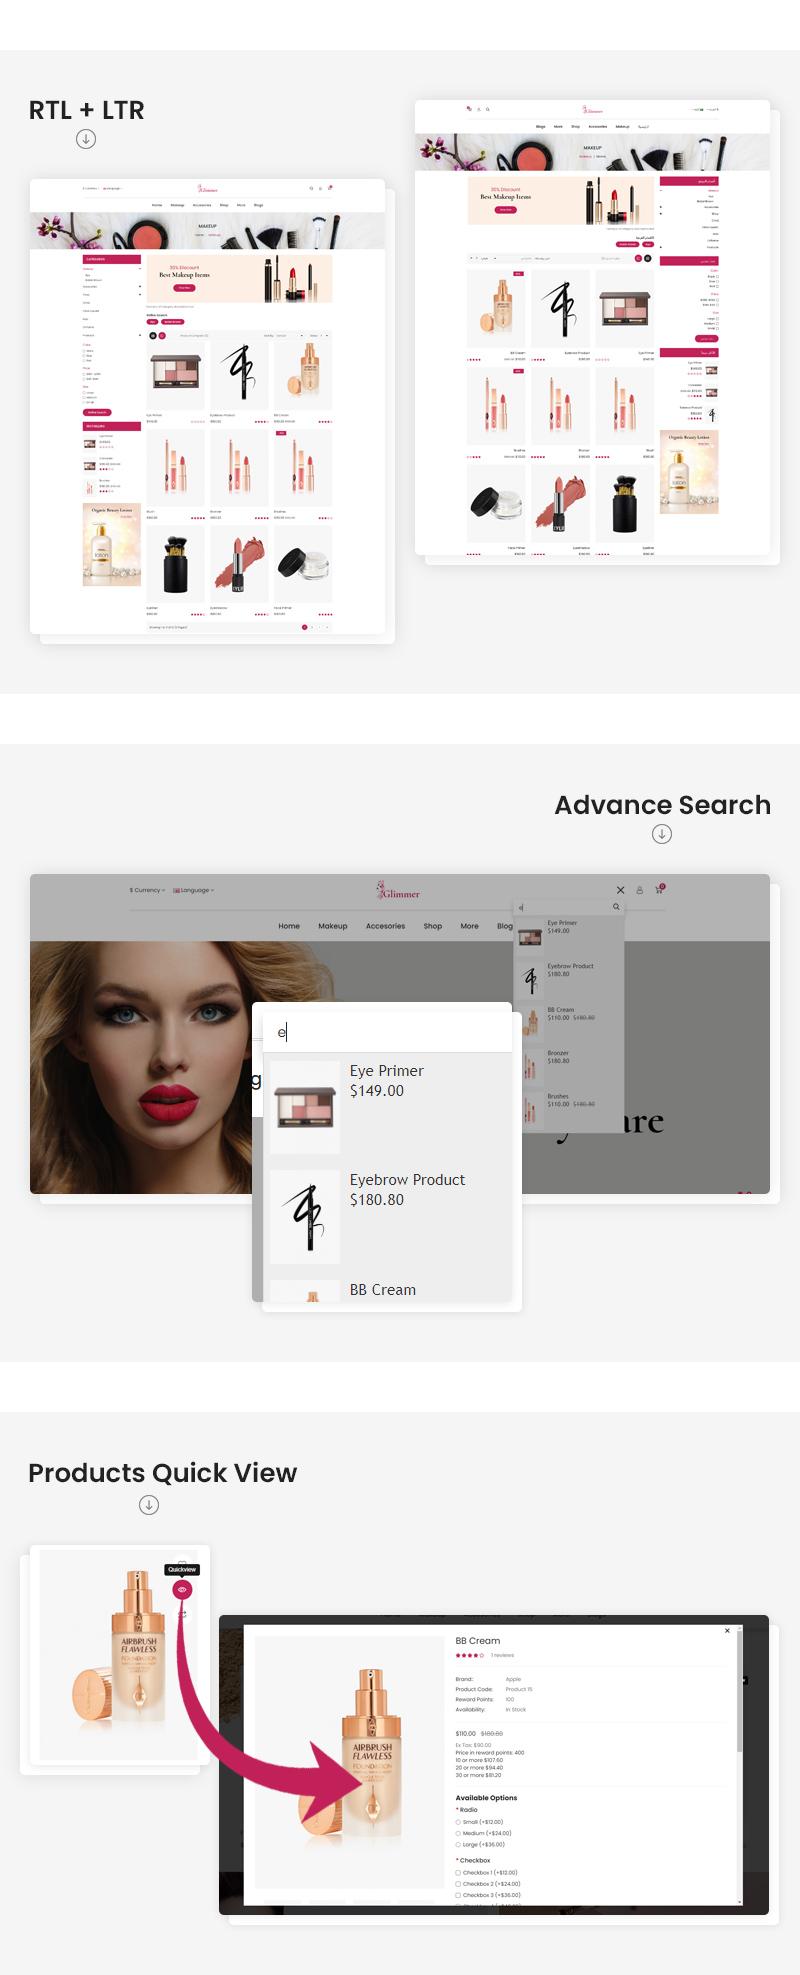 glimmer-features-2.jpg